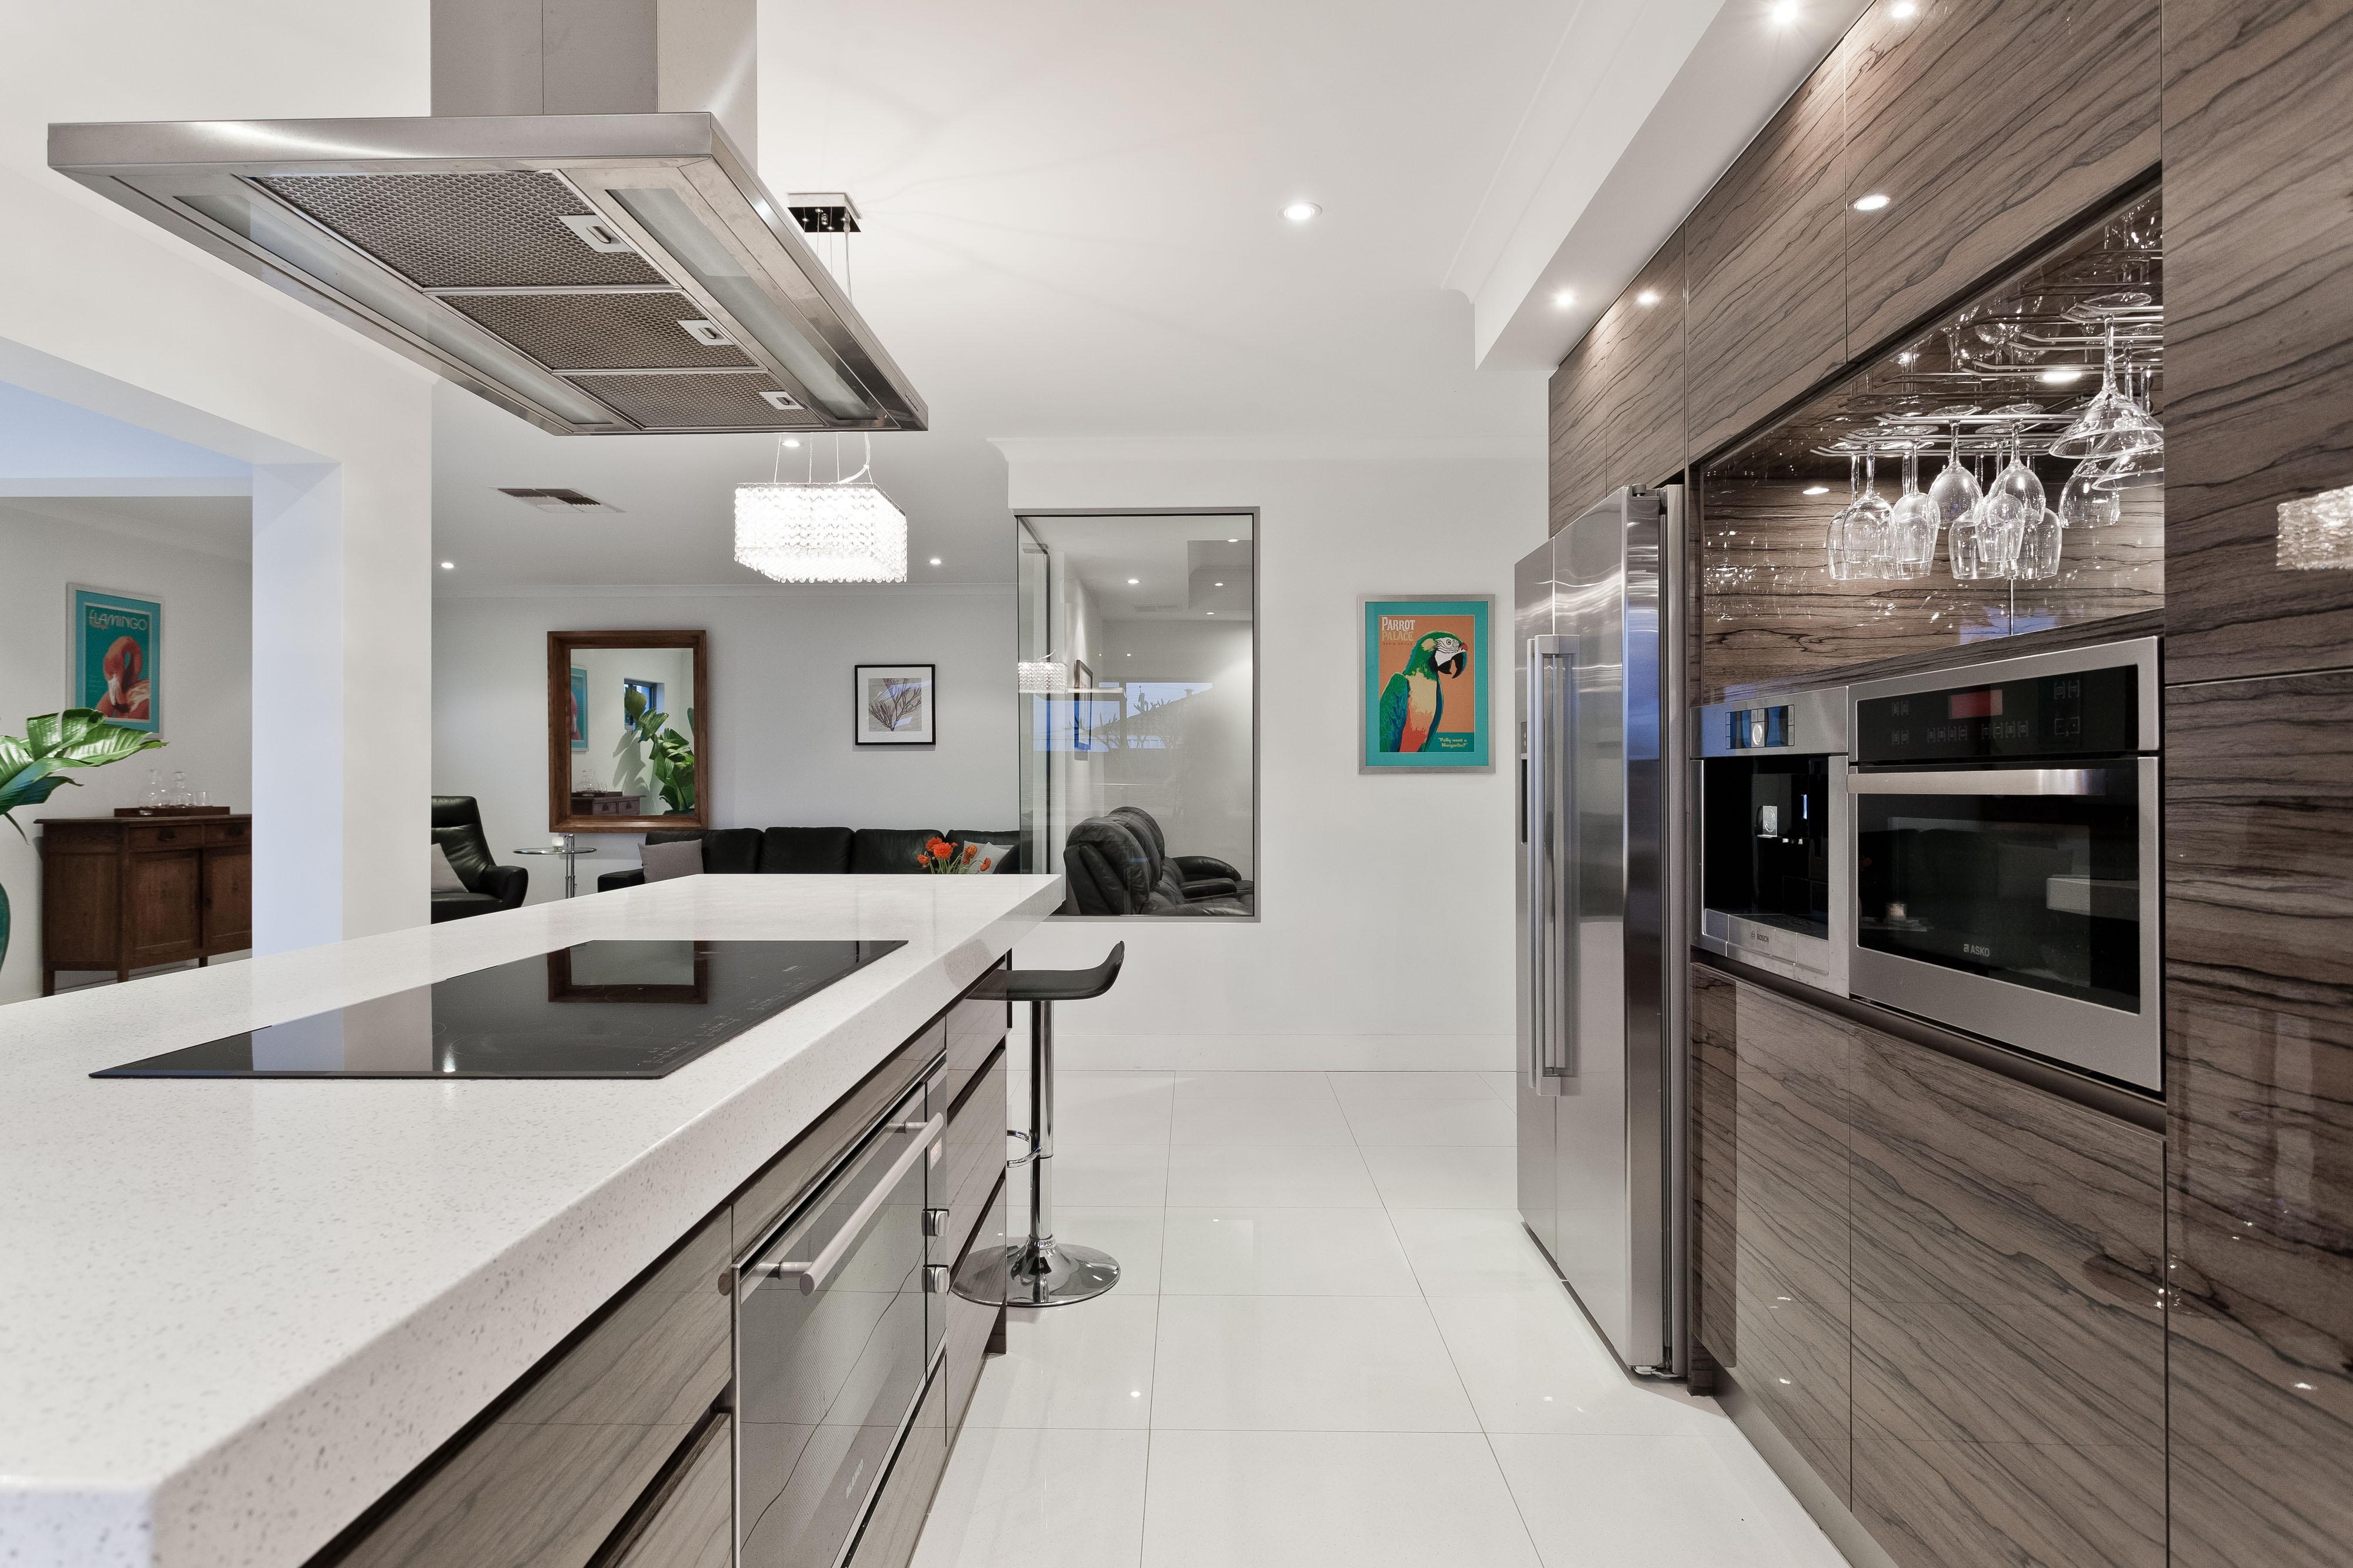 Home Design 8.0 Free Download Part - 45: Floor Building Home Ceiling Office Kitchen Property Living Room Room  Lifestyle Interior Design Living Design Dining